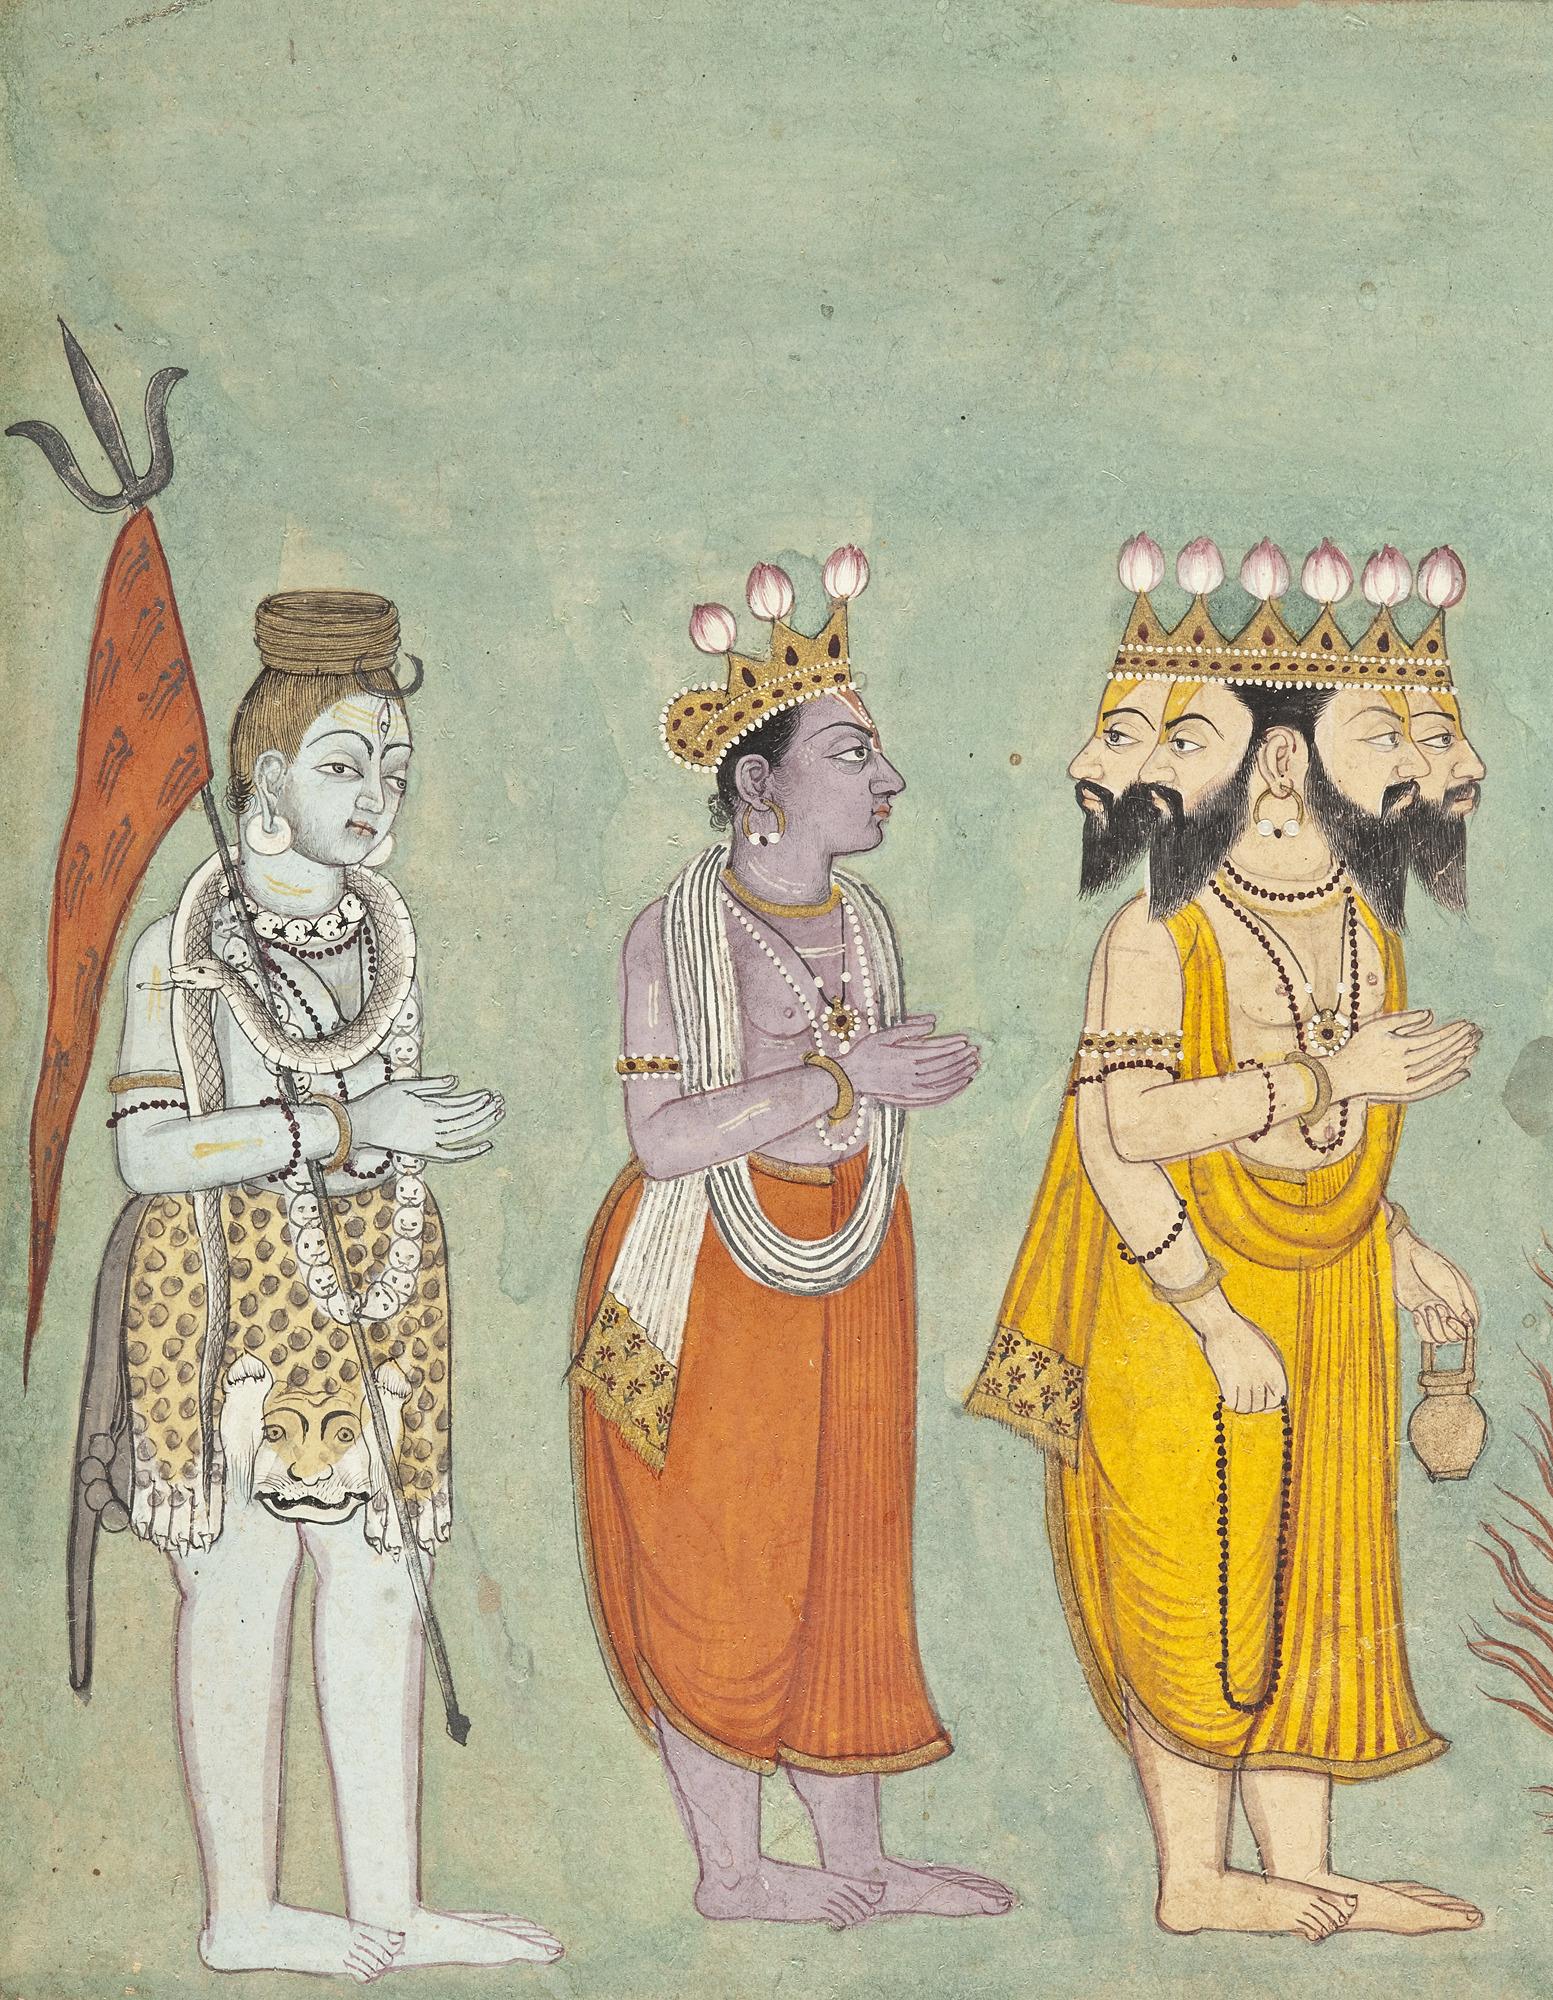 https://upload.wikimedia.org/wikipedia/commons/7/70/Shiva%2C_Vishnu%2C_and_Brahma_Adoring_Kali_LACMA_M.80.101_%282_of_7%29.jpg